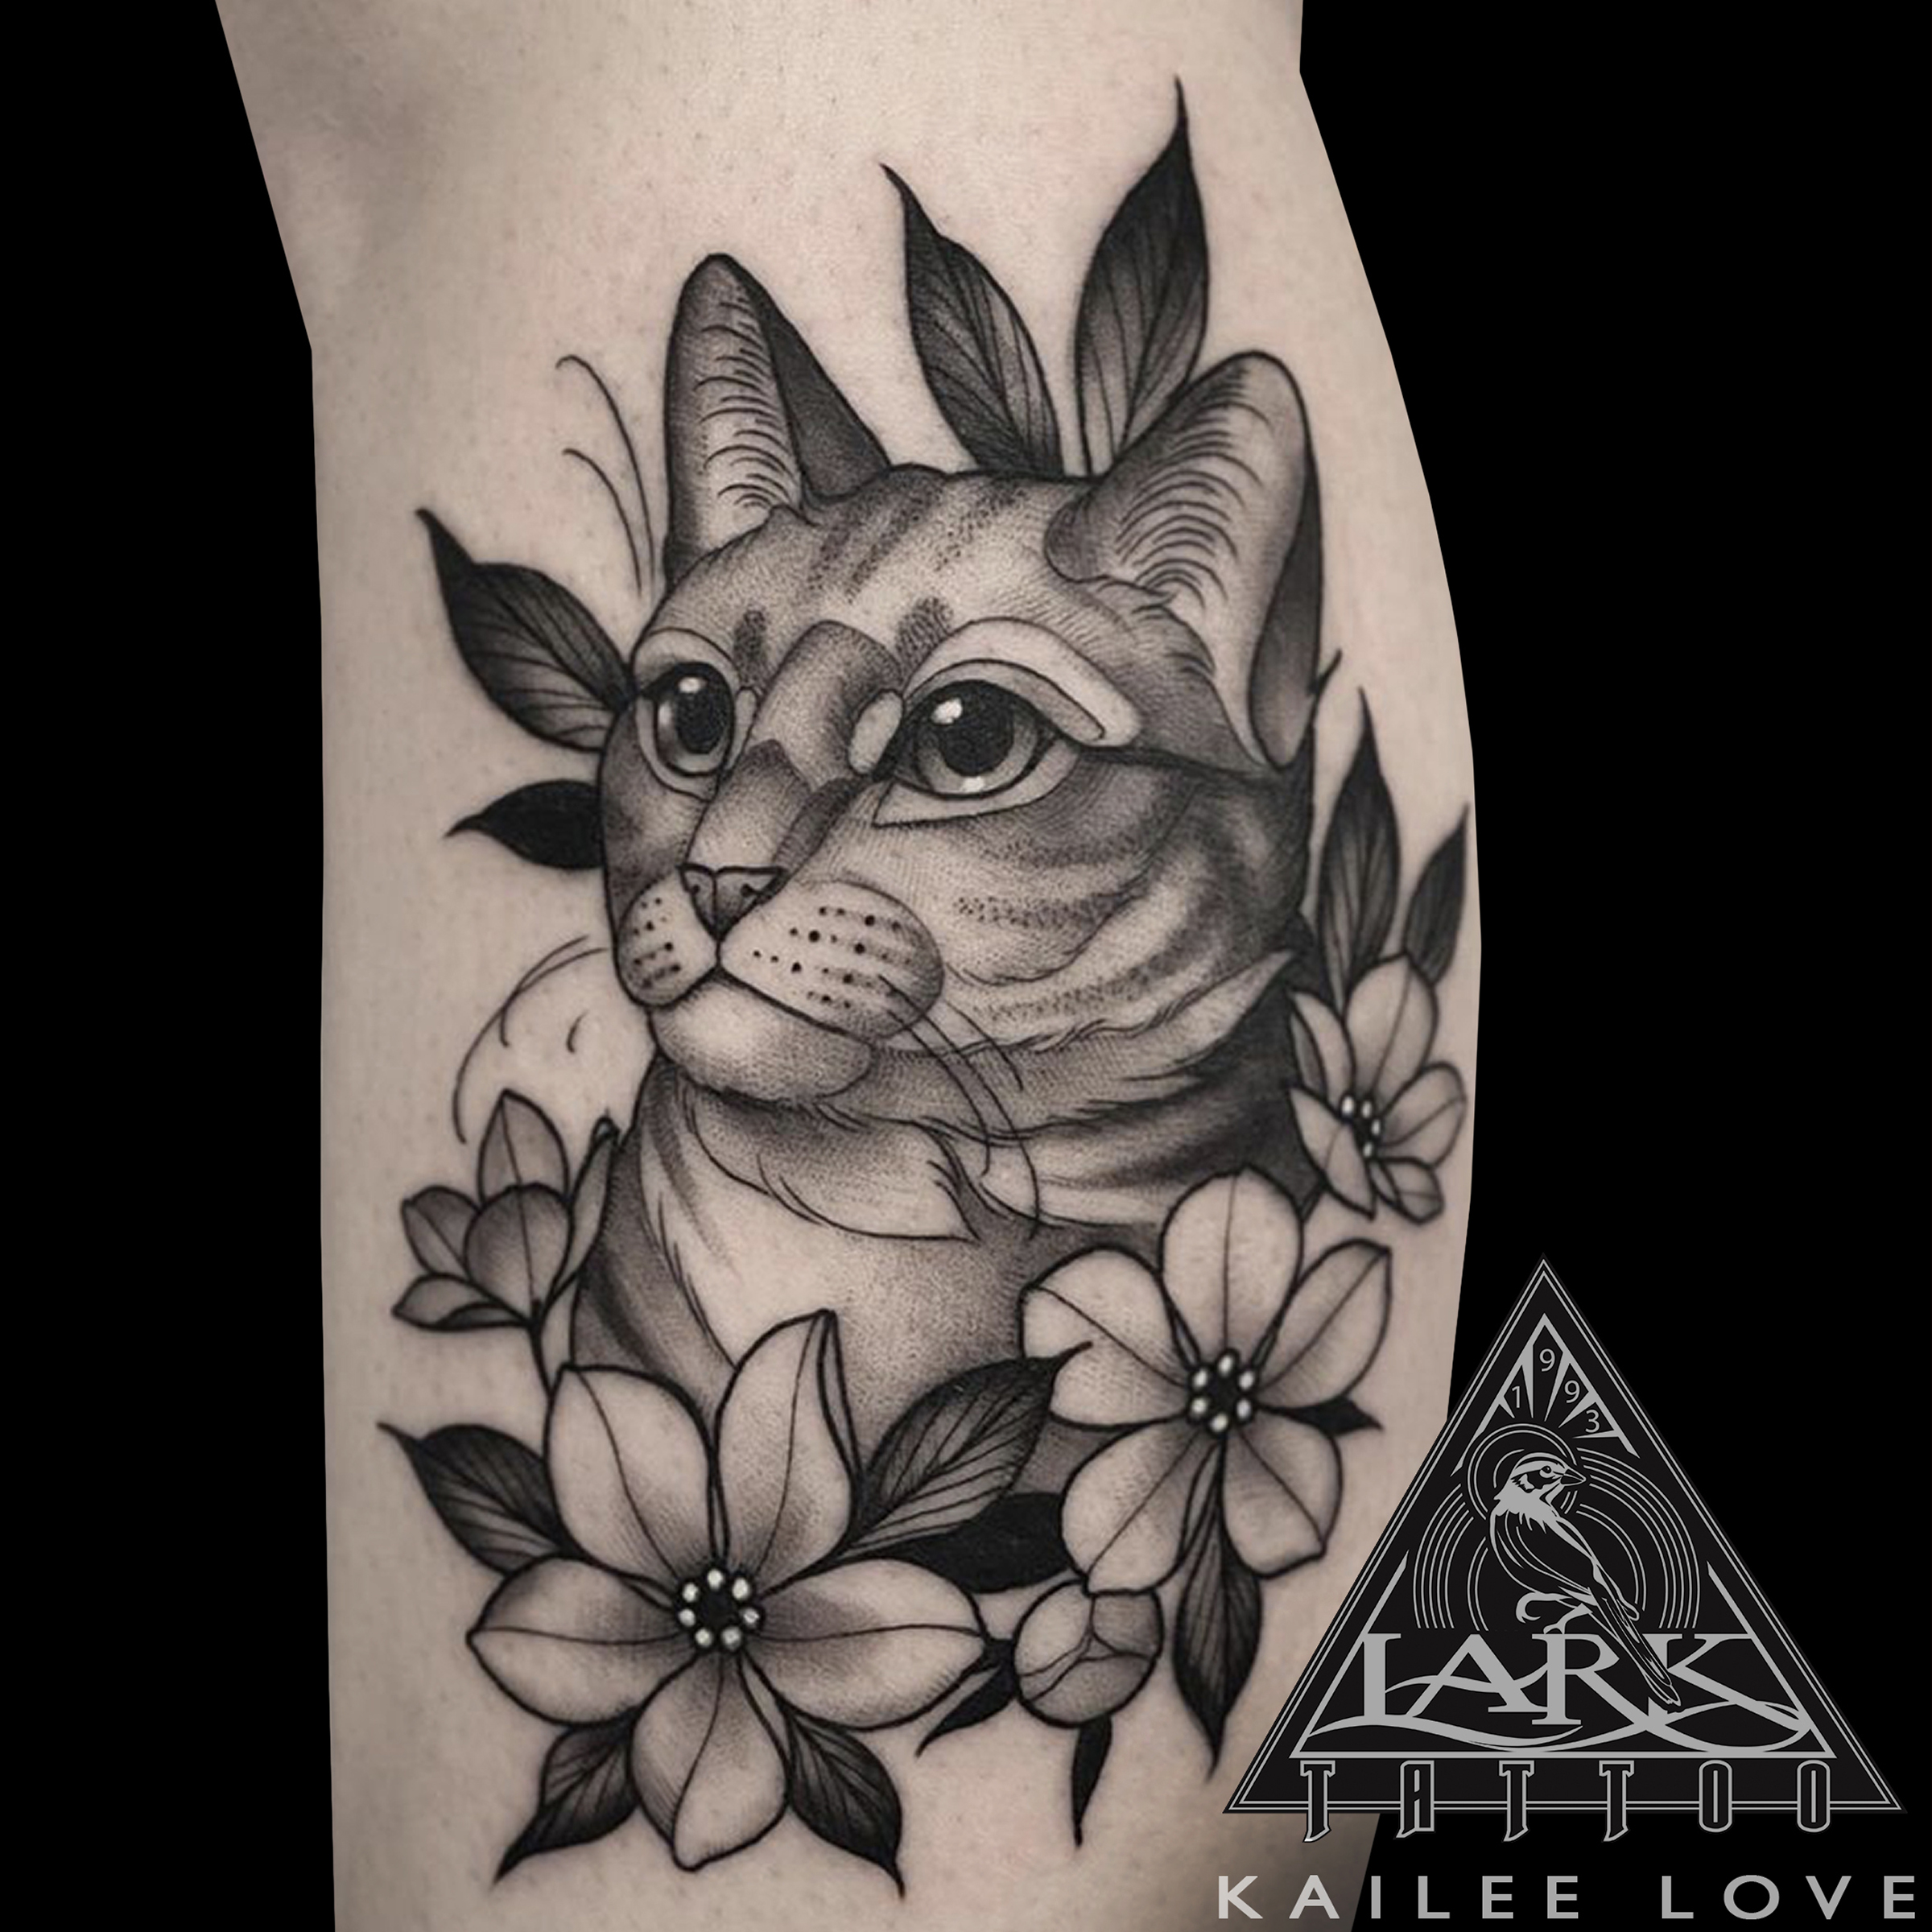 LarkTattoo, KaileeLove, KaileeLoveLarkTattoo, Tattoo, Tattoos, Cat, CatTattoo, Cattoo, Feline, FelineTattoo, Animal, AnimalTattoo, BlackAndGray, BlackAndGrayTattoo, BlackAndGrey, BlackAndGreyTattoo, BNG, BNGTattoo, BNGInkSociety, CatLovers, Flower, FlowerTattoo, FemaleArtist, FemaleTattooer, FemaleTattooArtist, TattooArtist, Tattoist, Tattooer, LongIslandTattooArtist, LongIslandTattooer, LongIslandTattoo, TattooOfTheDay, Tat, Tats, Tatts, Tatted, Inked, Ink, TattooInk, AmazingInk, AmazingTattoo, BodyArt, LarkTattooWestbury, Westbury, LongIsland, NY, NewYork, USA, Art, Tattedup, InkedUp, LarkTattoos